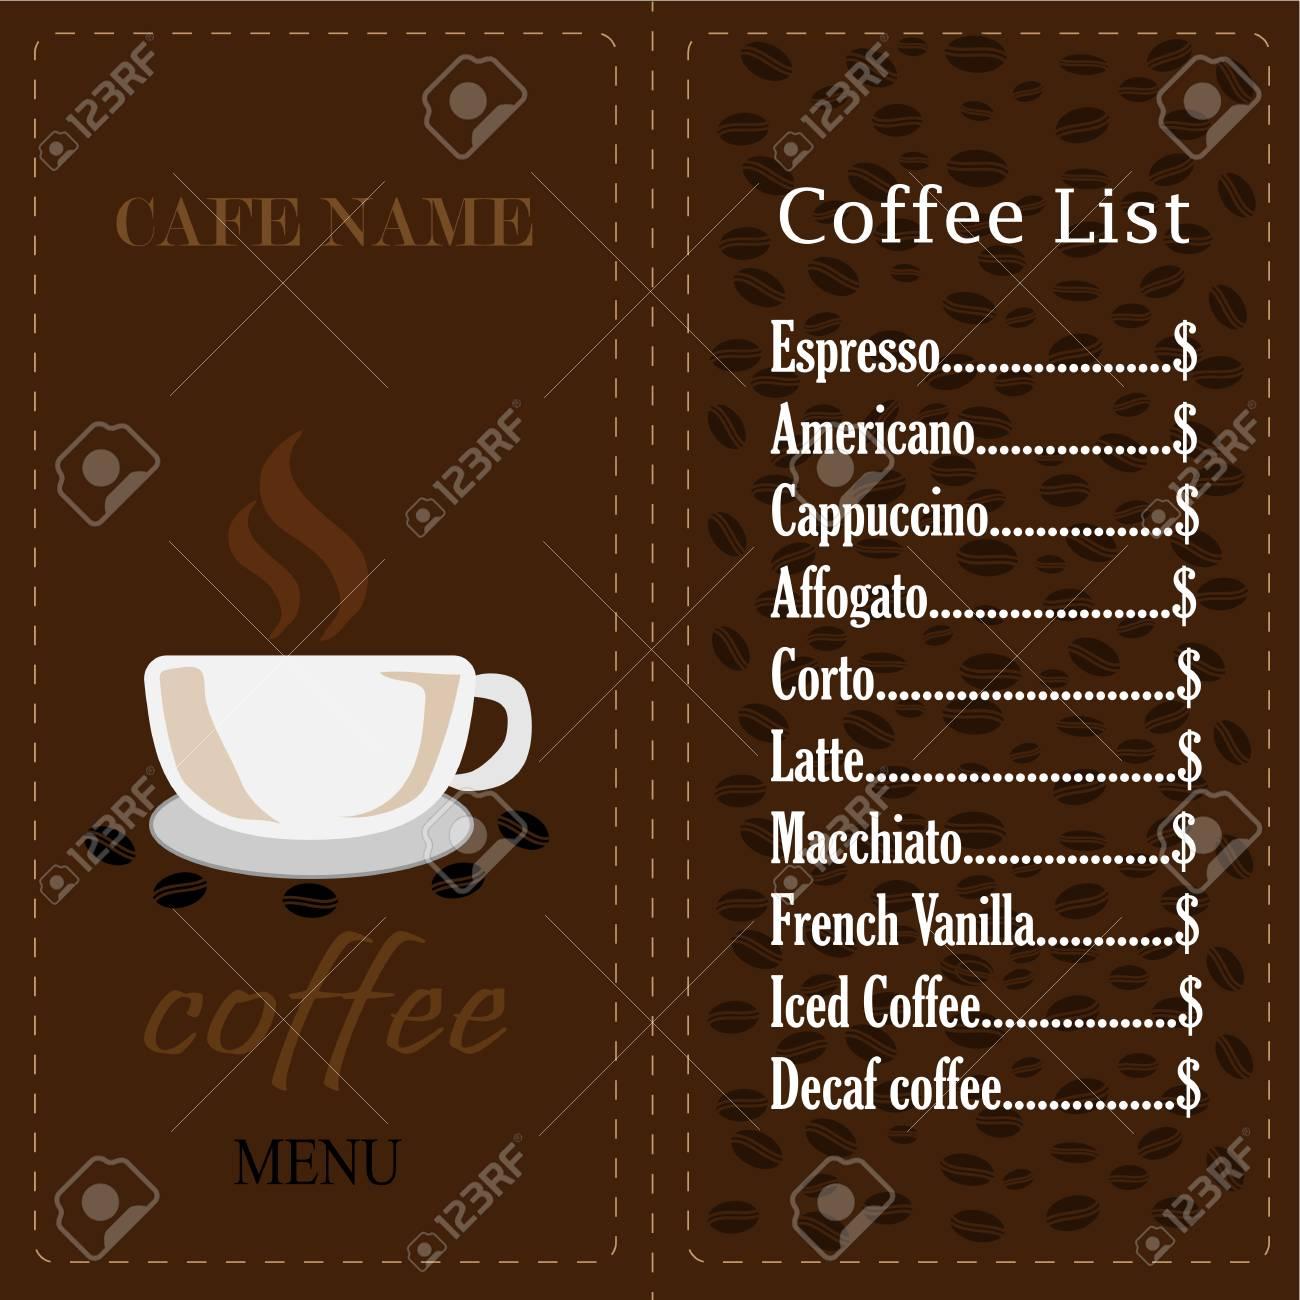 Coffee Shop Logo And Menu Design Vector Brochure Template. Coffee Cup  Silhouette. Stock Vector